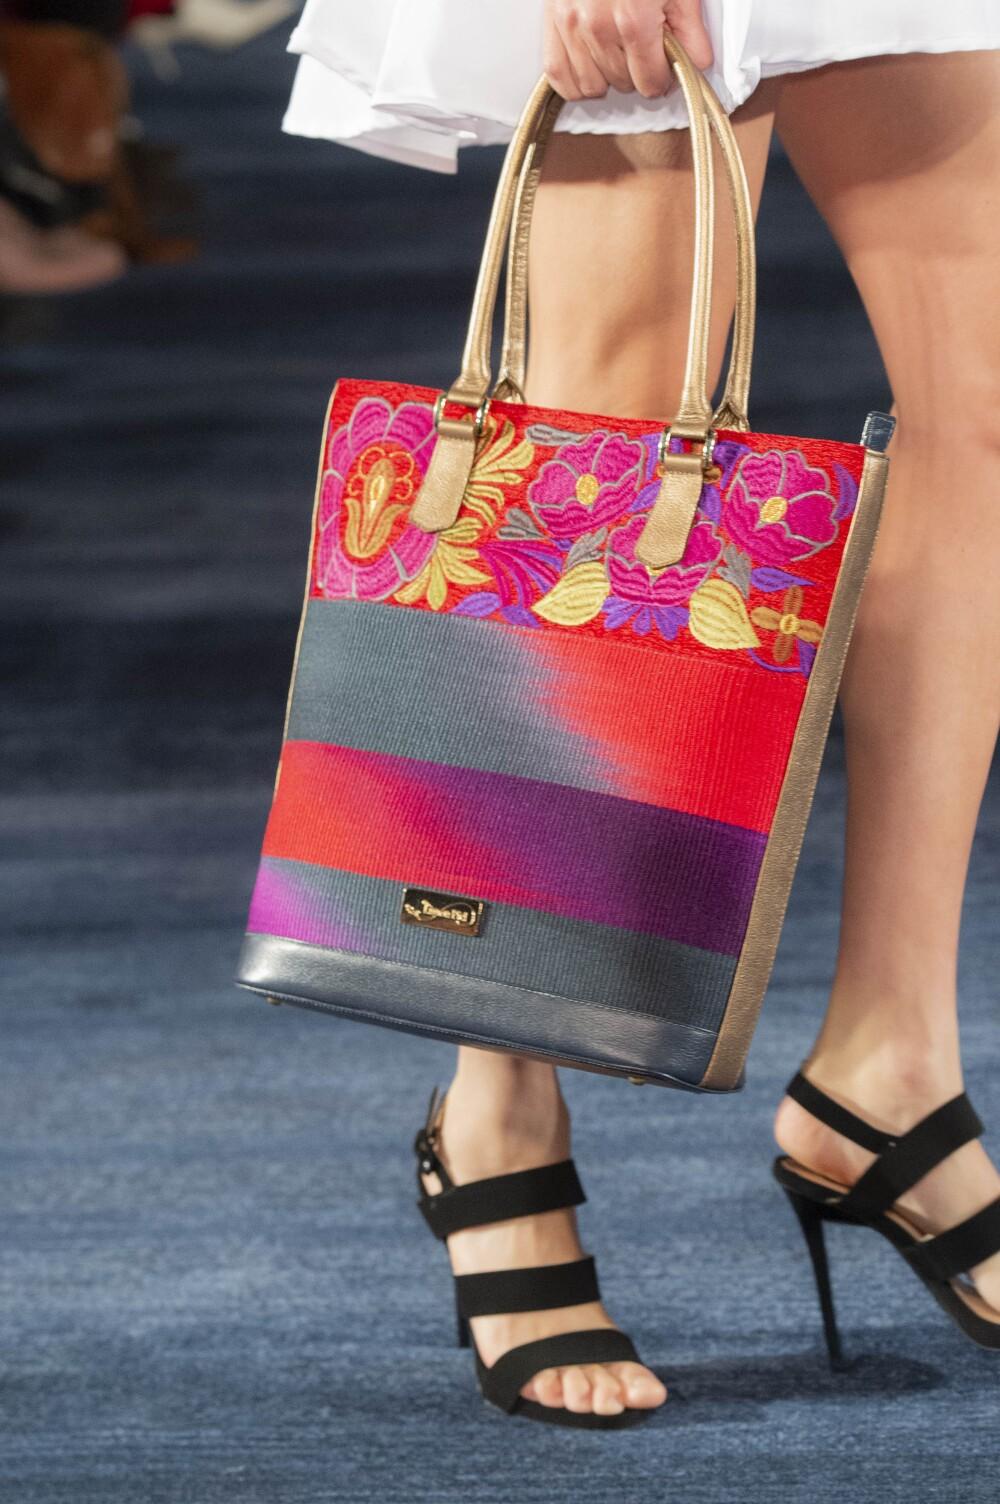 Calzado femenino y bolso